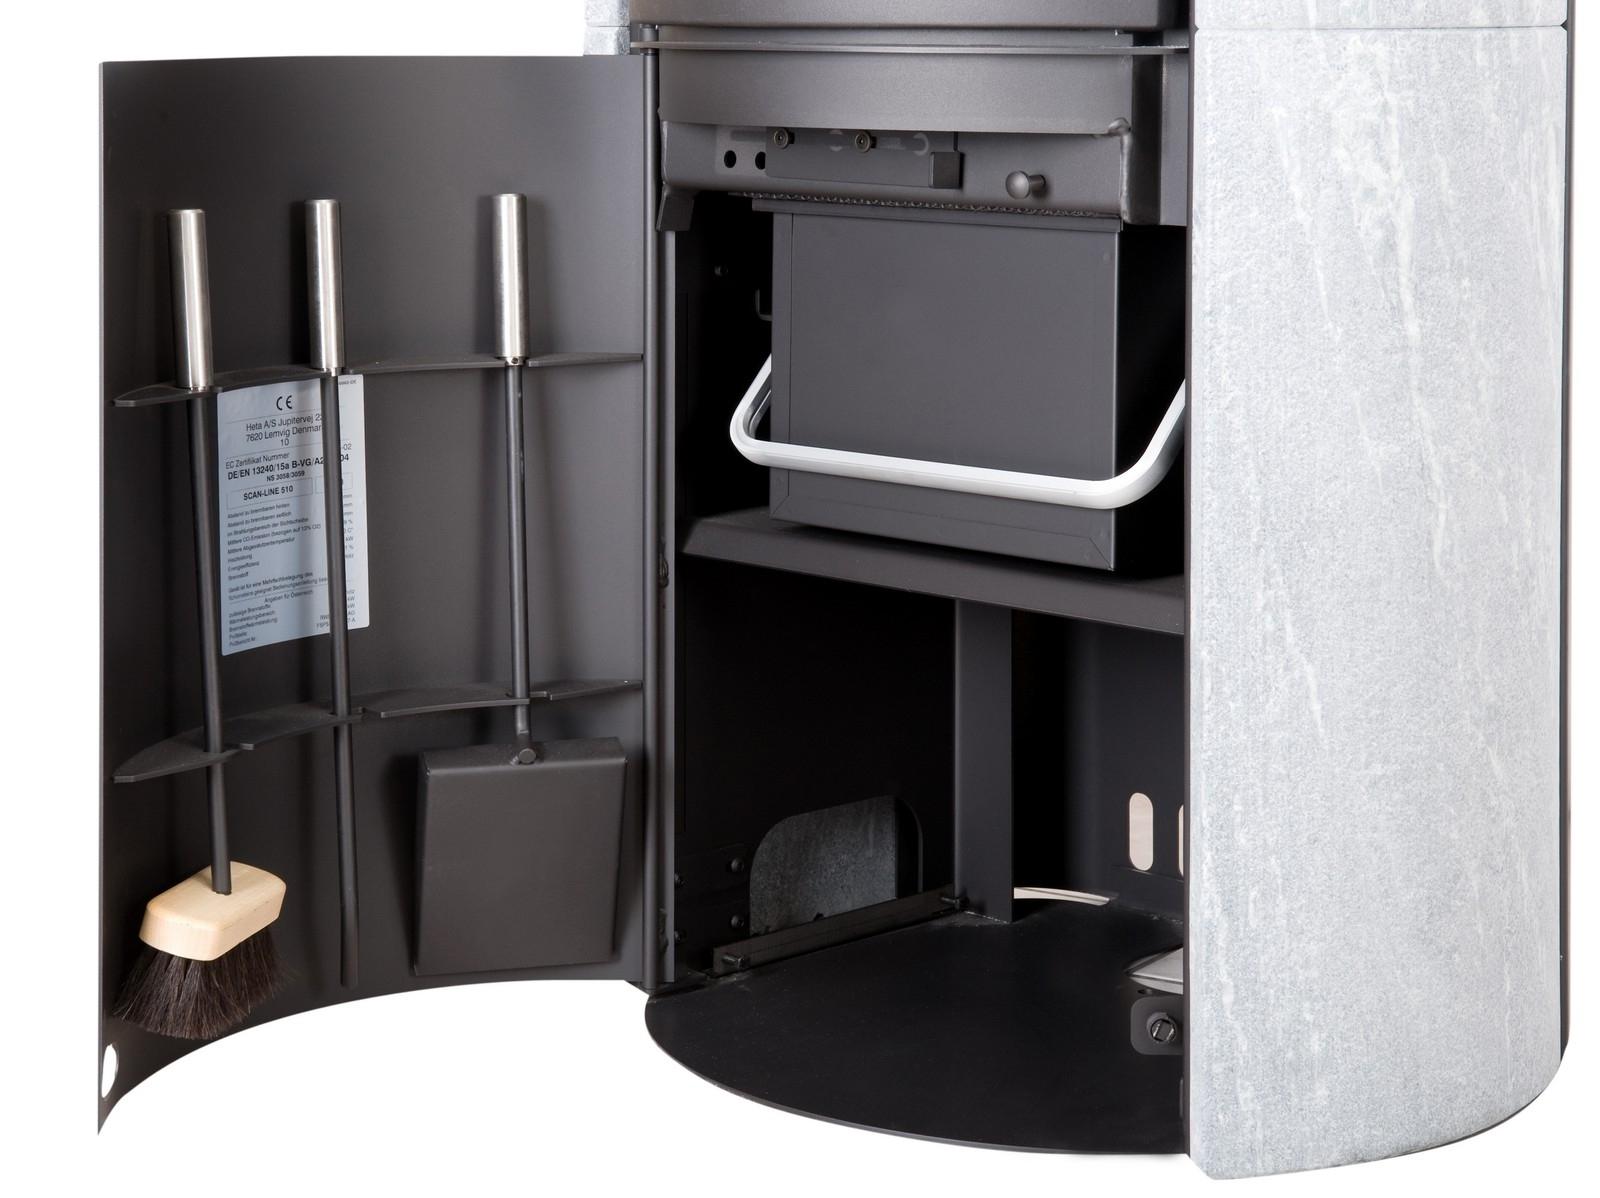 heta sl 820 ollaire r f chauffage po les bois accumulation espace po le scandinave. Black Bedroom Furniture Sets. Home Design Ideas